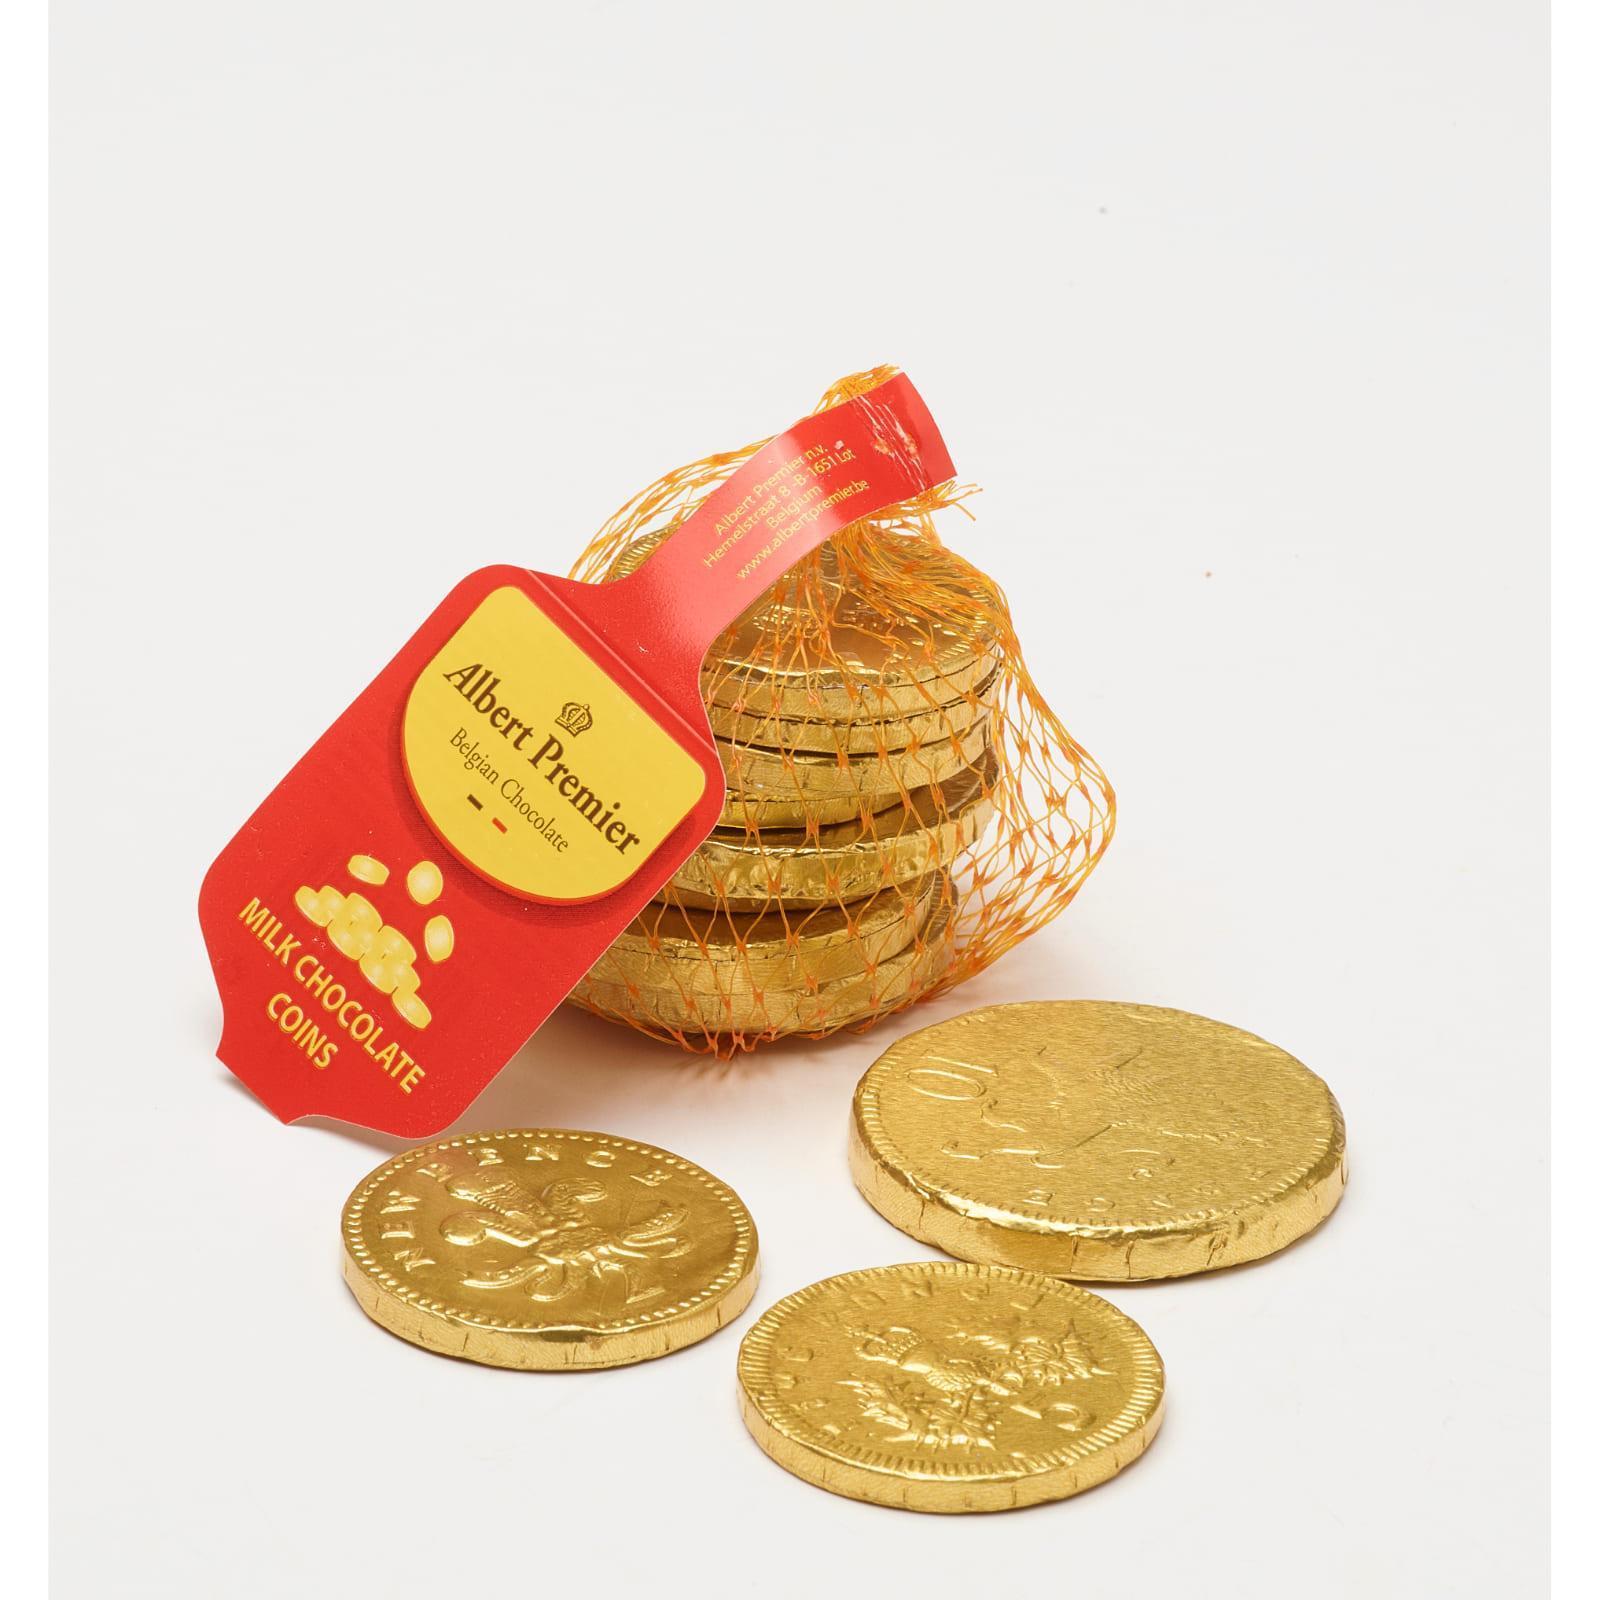 Albert Premier Belgian Milk Chocolate Gold Coins - Christmas Special